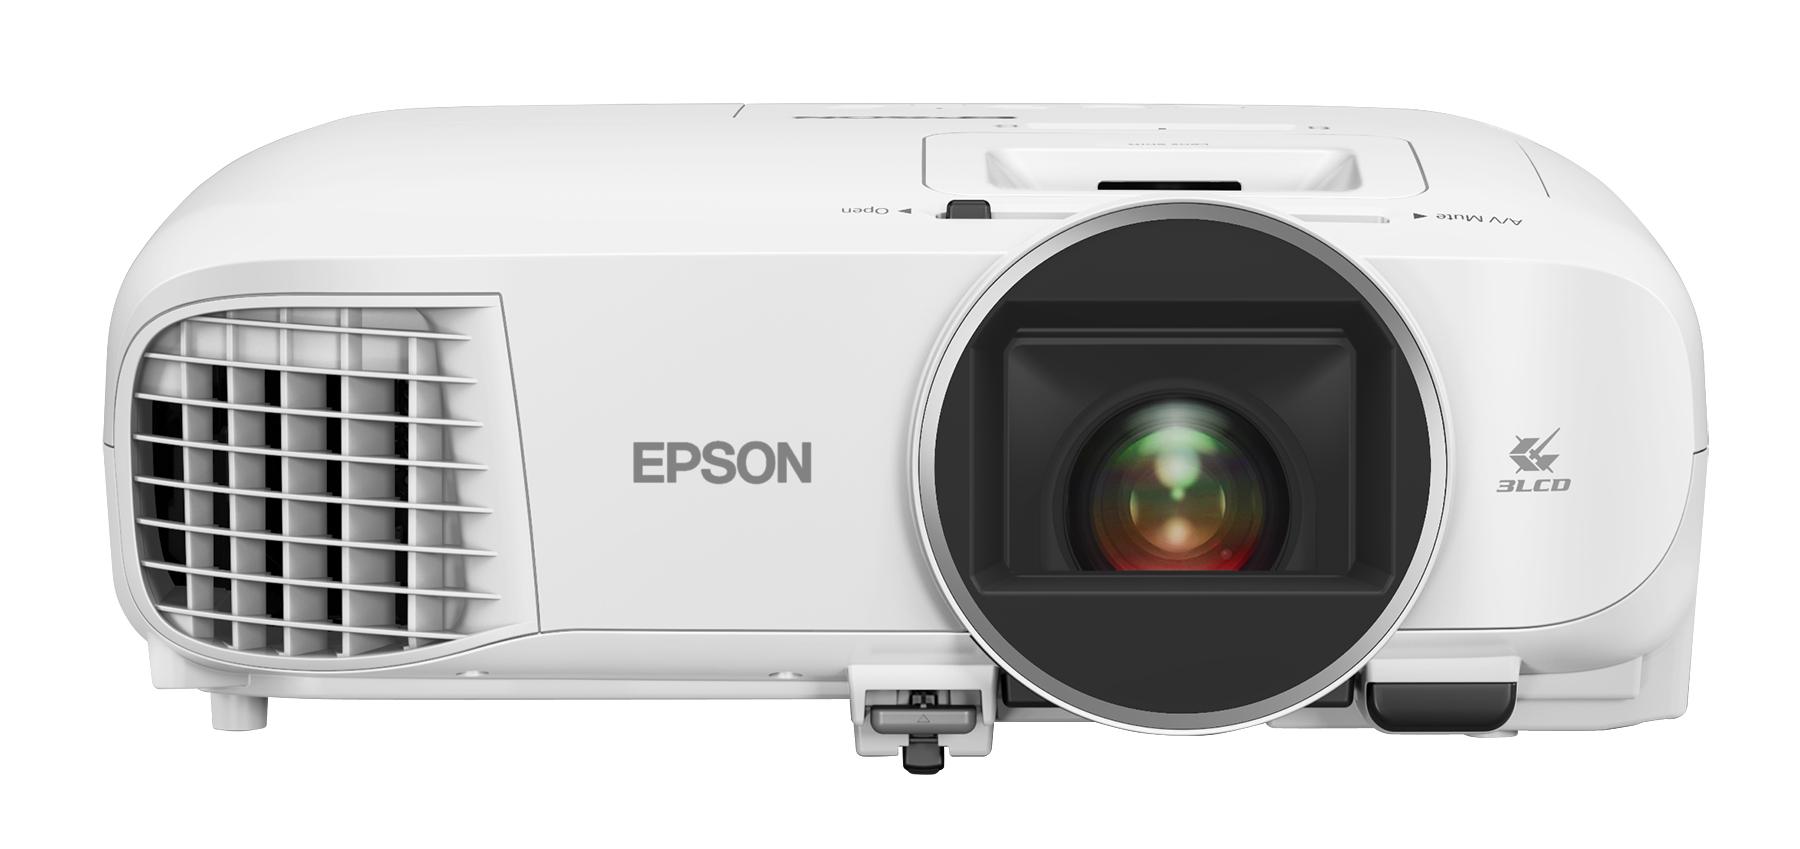 YMMV: Epson Home Cinema Full HD, 1080p, 2,500 lumens color brightness (color light output), 2,500 lumens white brightness (white light output), 2x HDMI (1 MHL), 3LCD projector $79